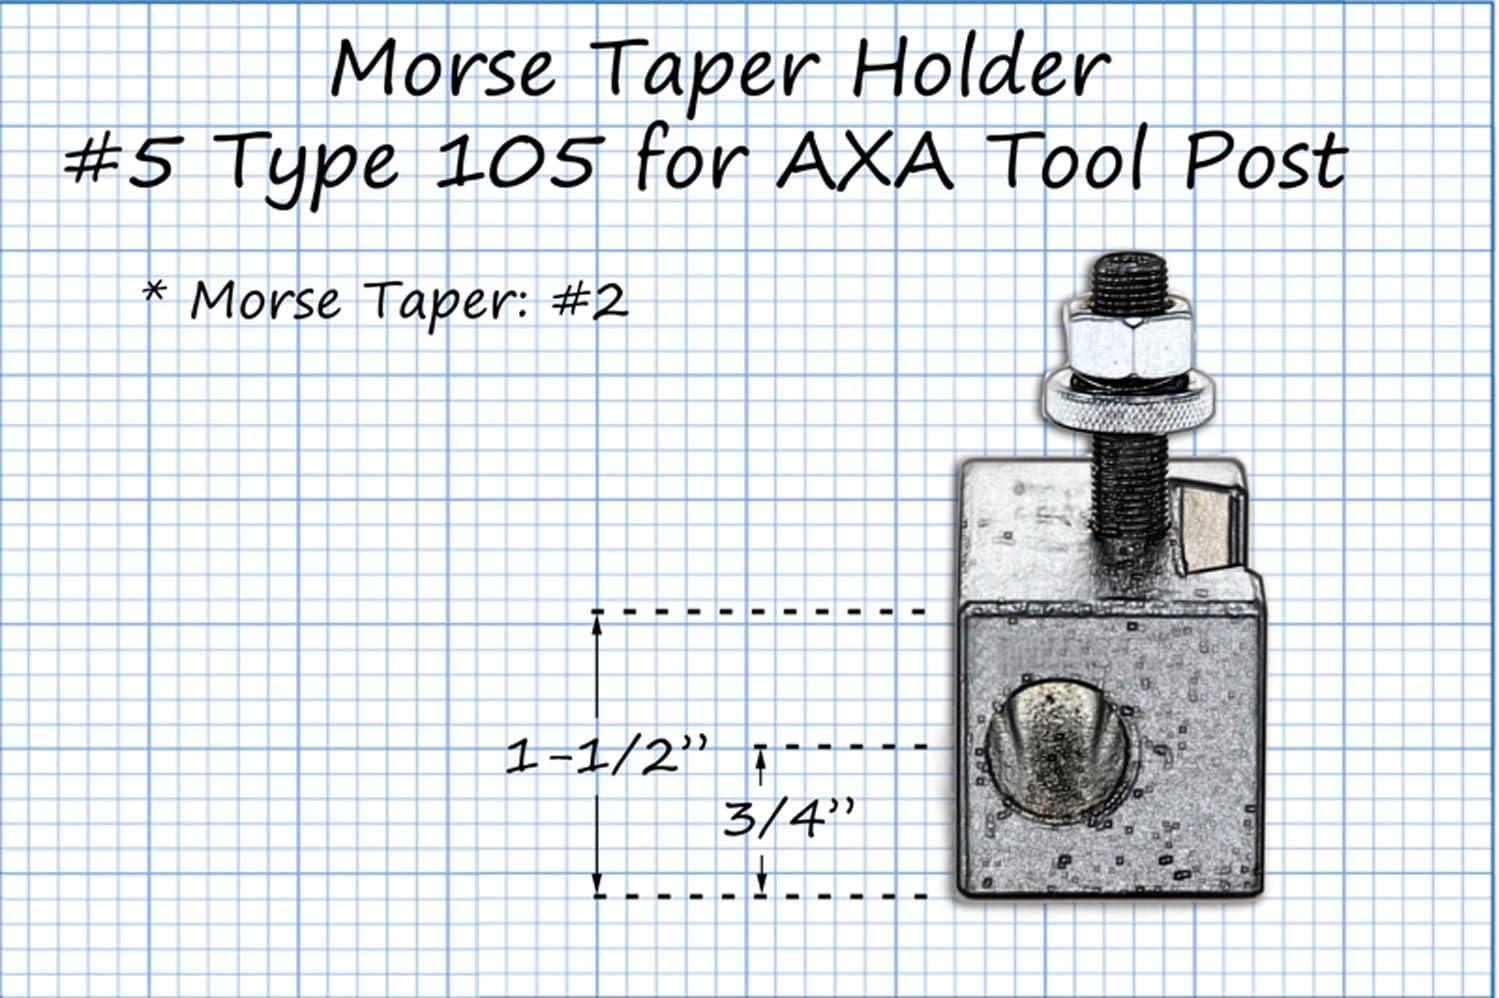 AXA #5 MT2 MORSE TAPER HOLDER FOR DRILLING CNC LATHE TOOL DRILL 250-105